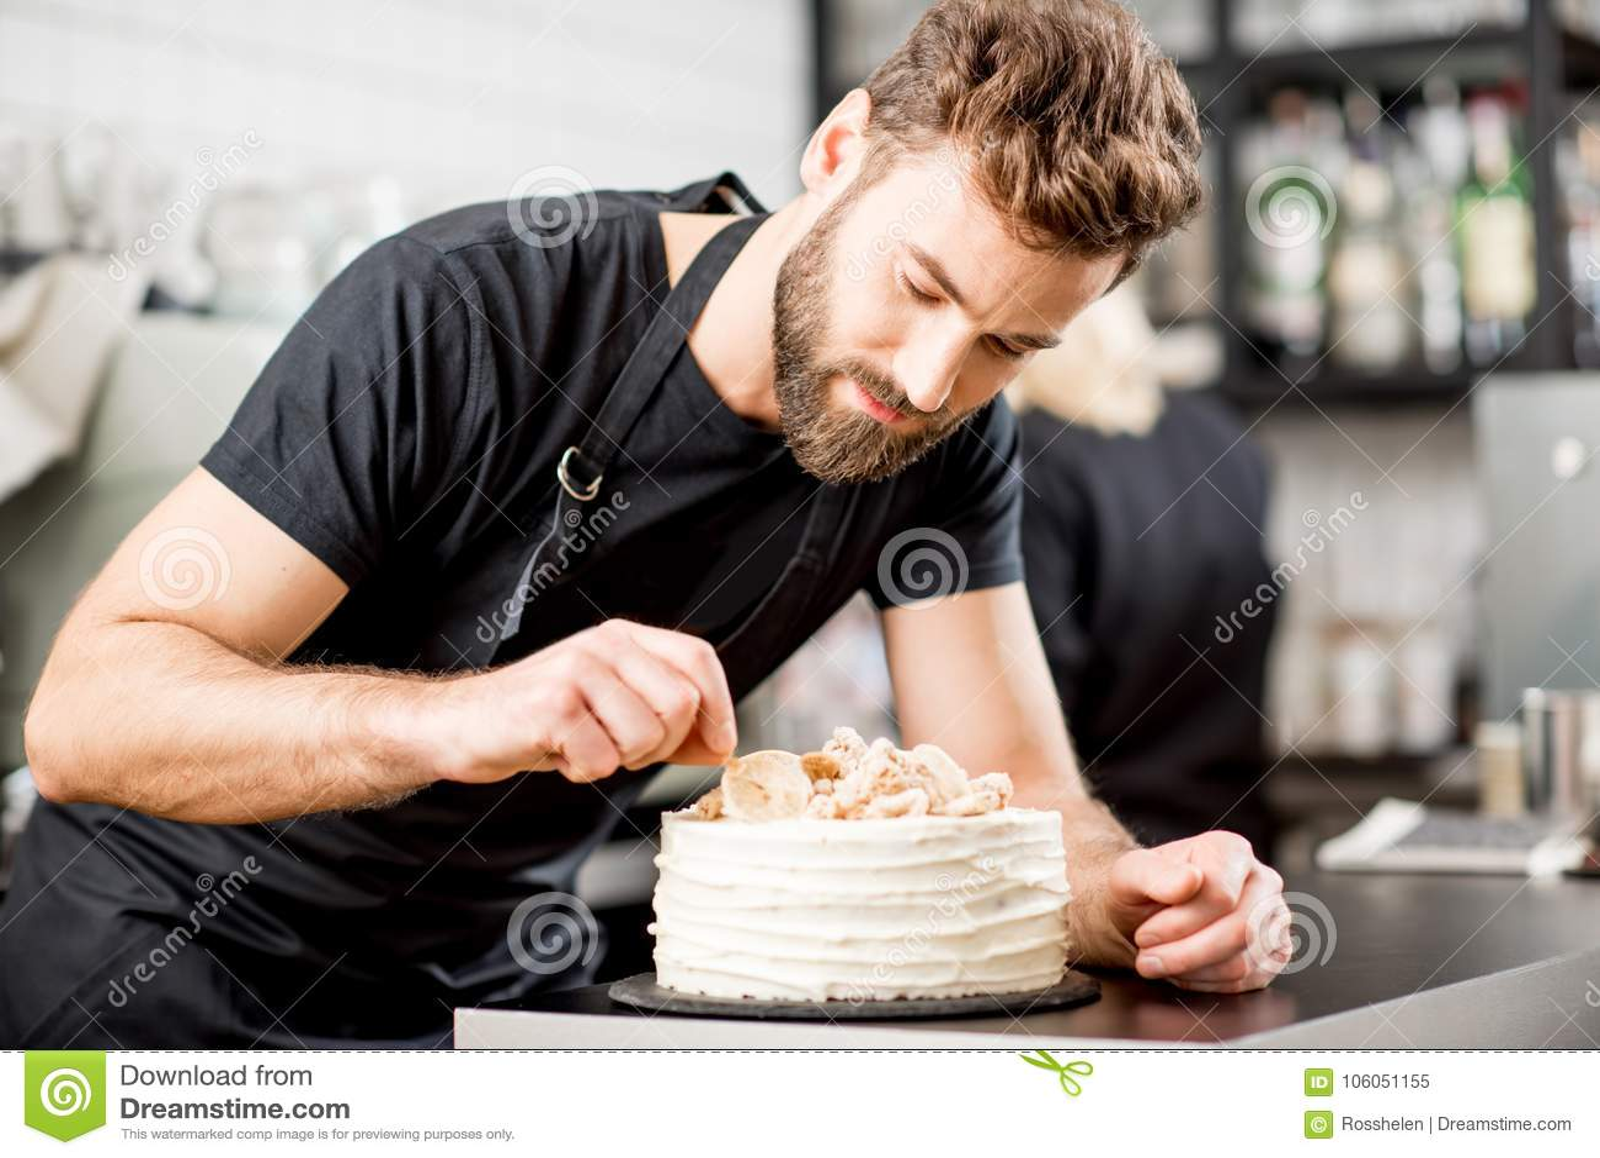 Confectioner decorating a pie